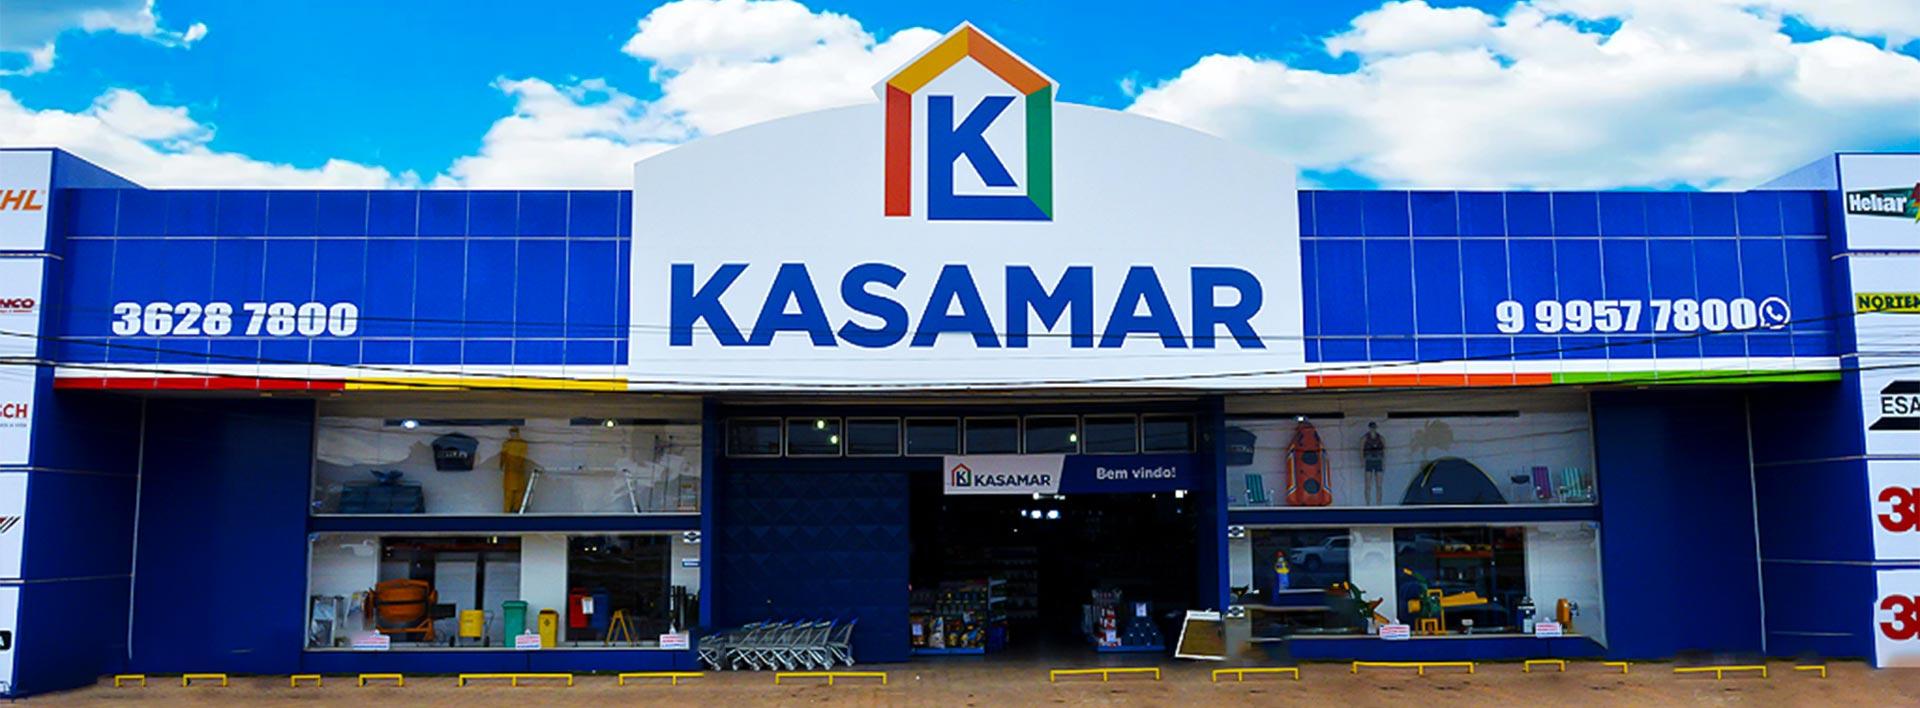 Banner Kasamar LEM - Loja Física